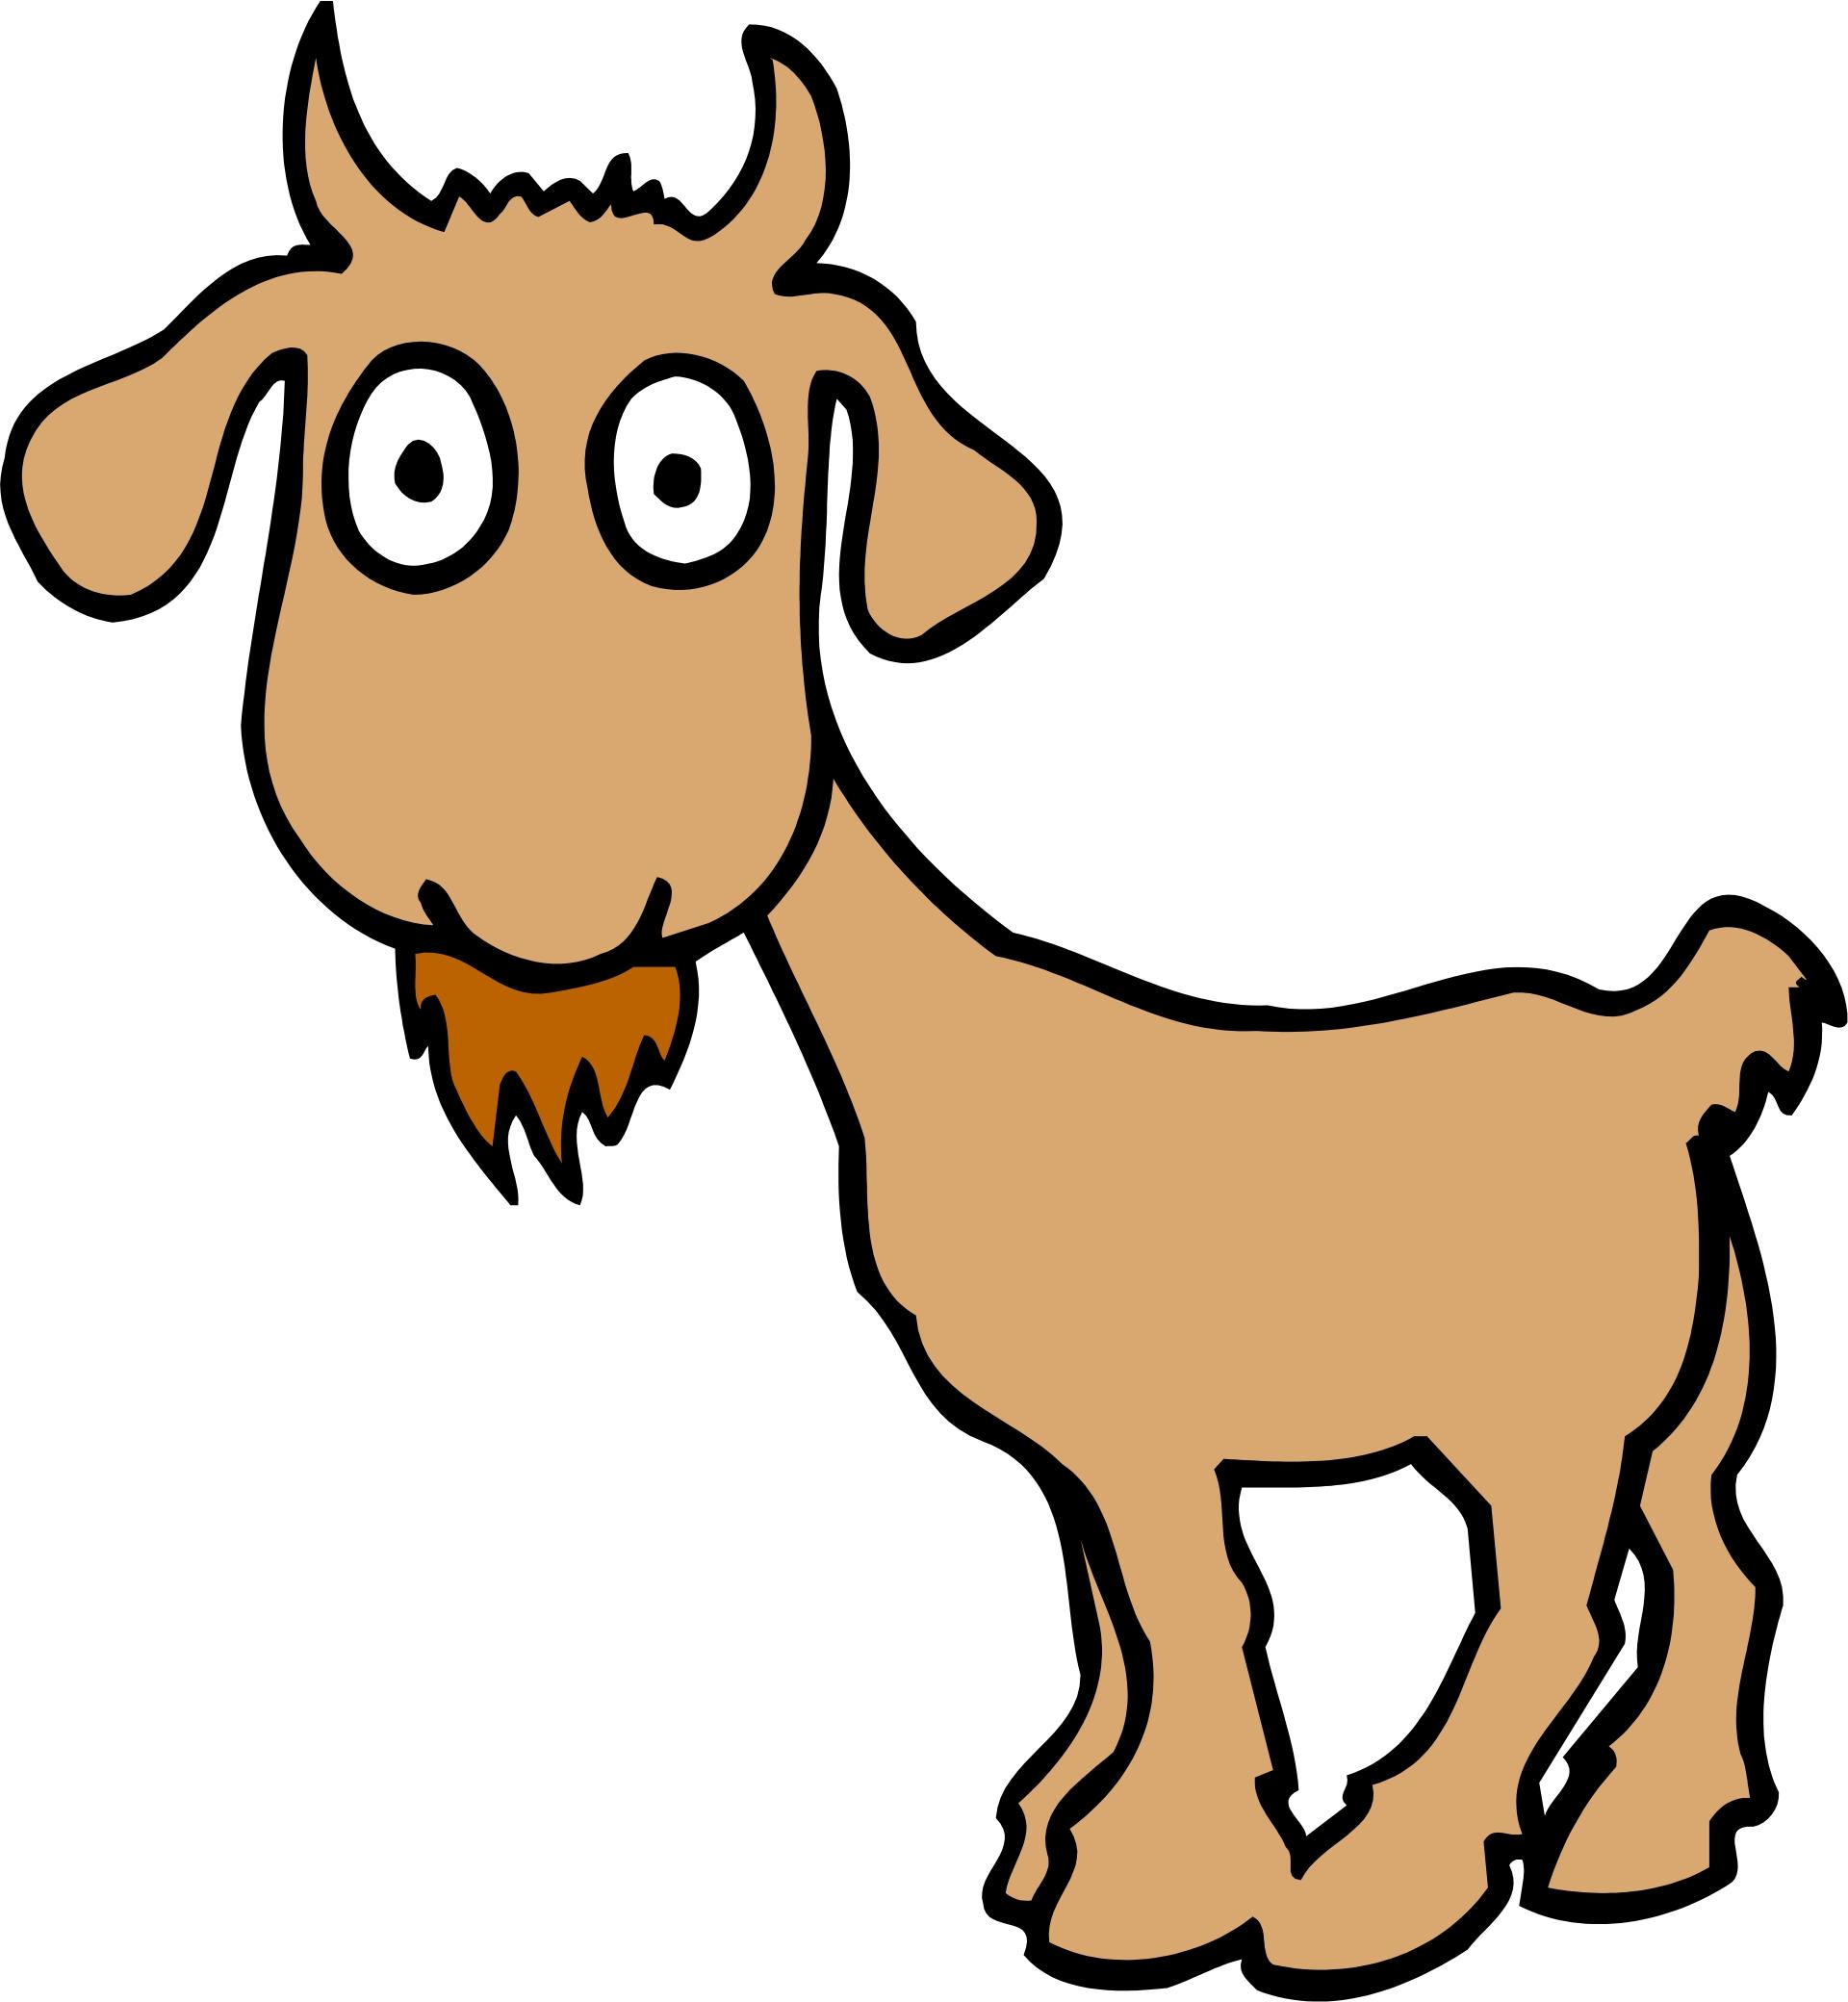 1920x2080 Goat Clipart Easy